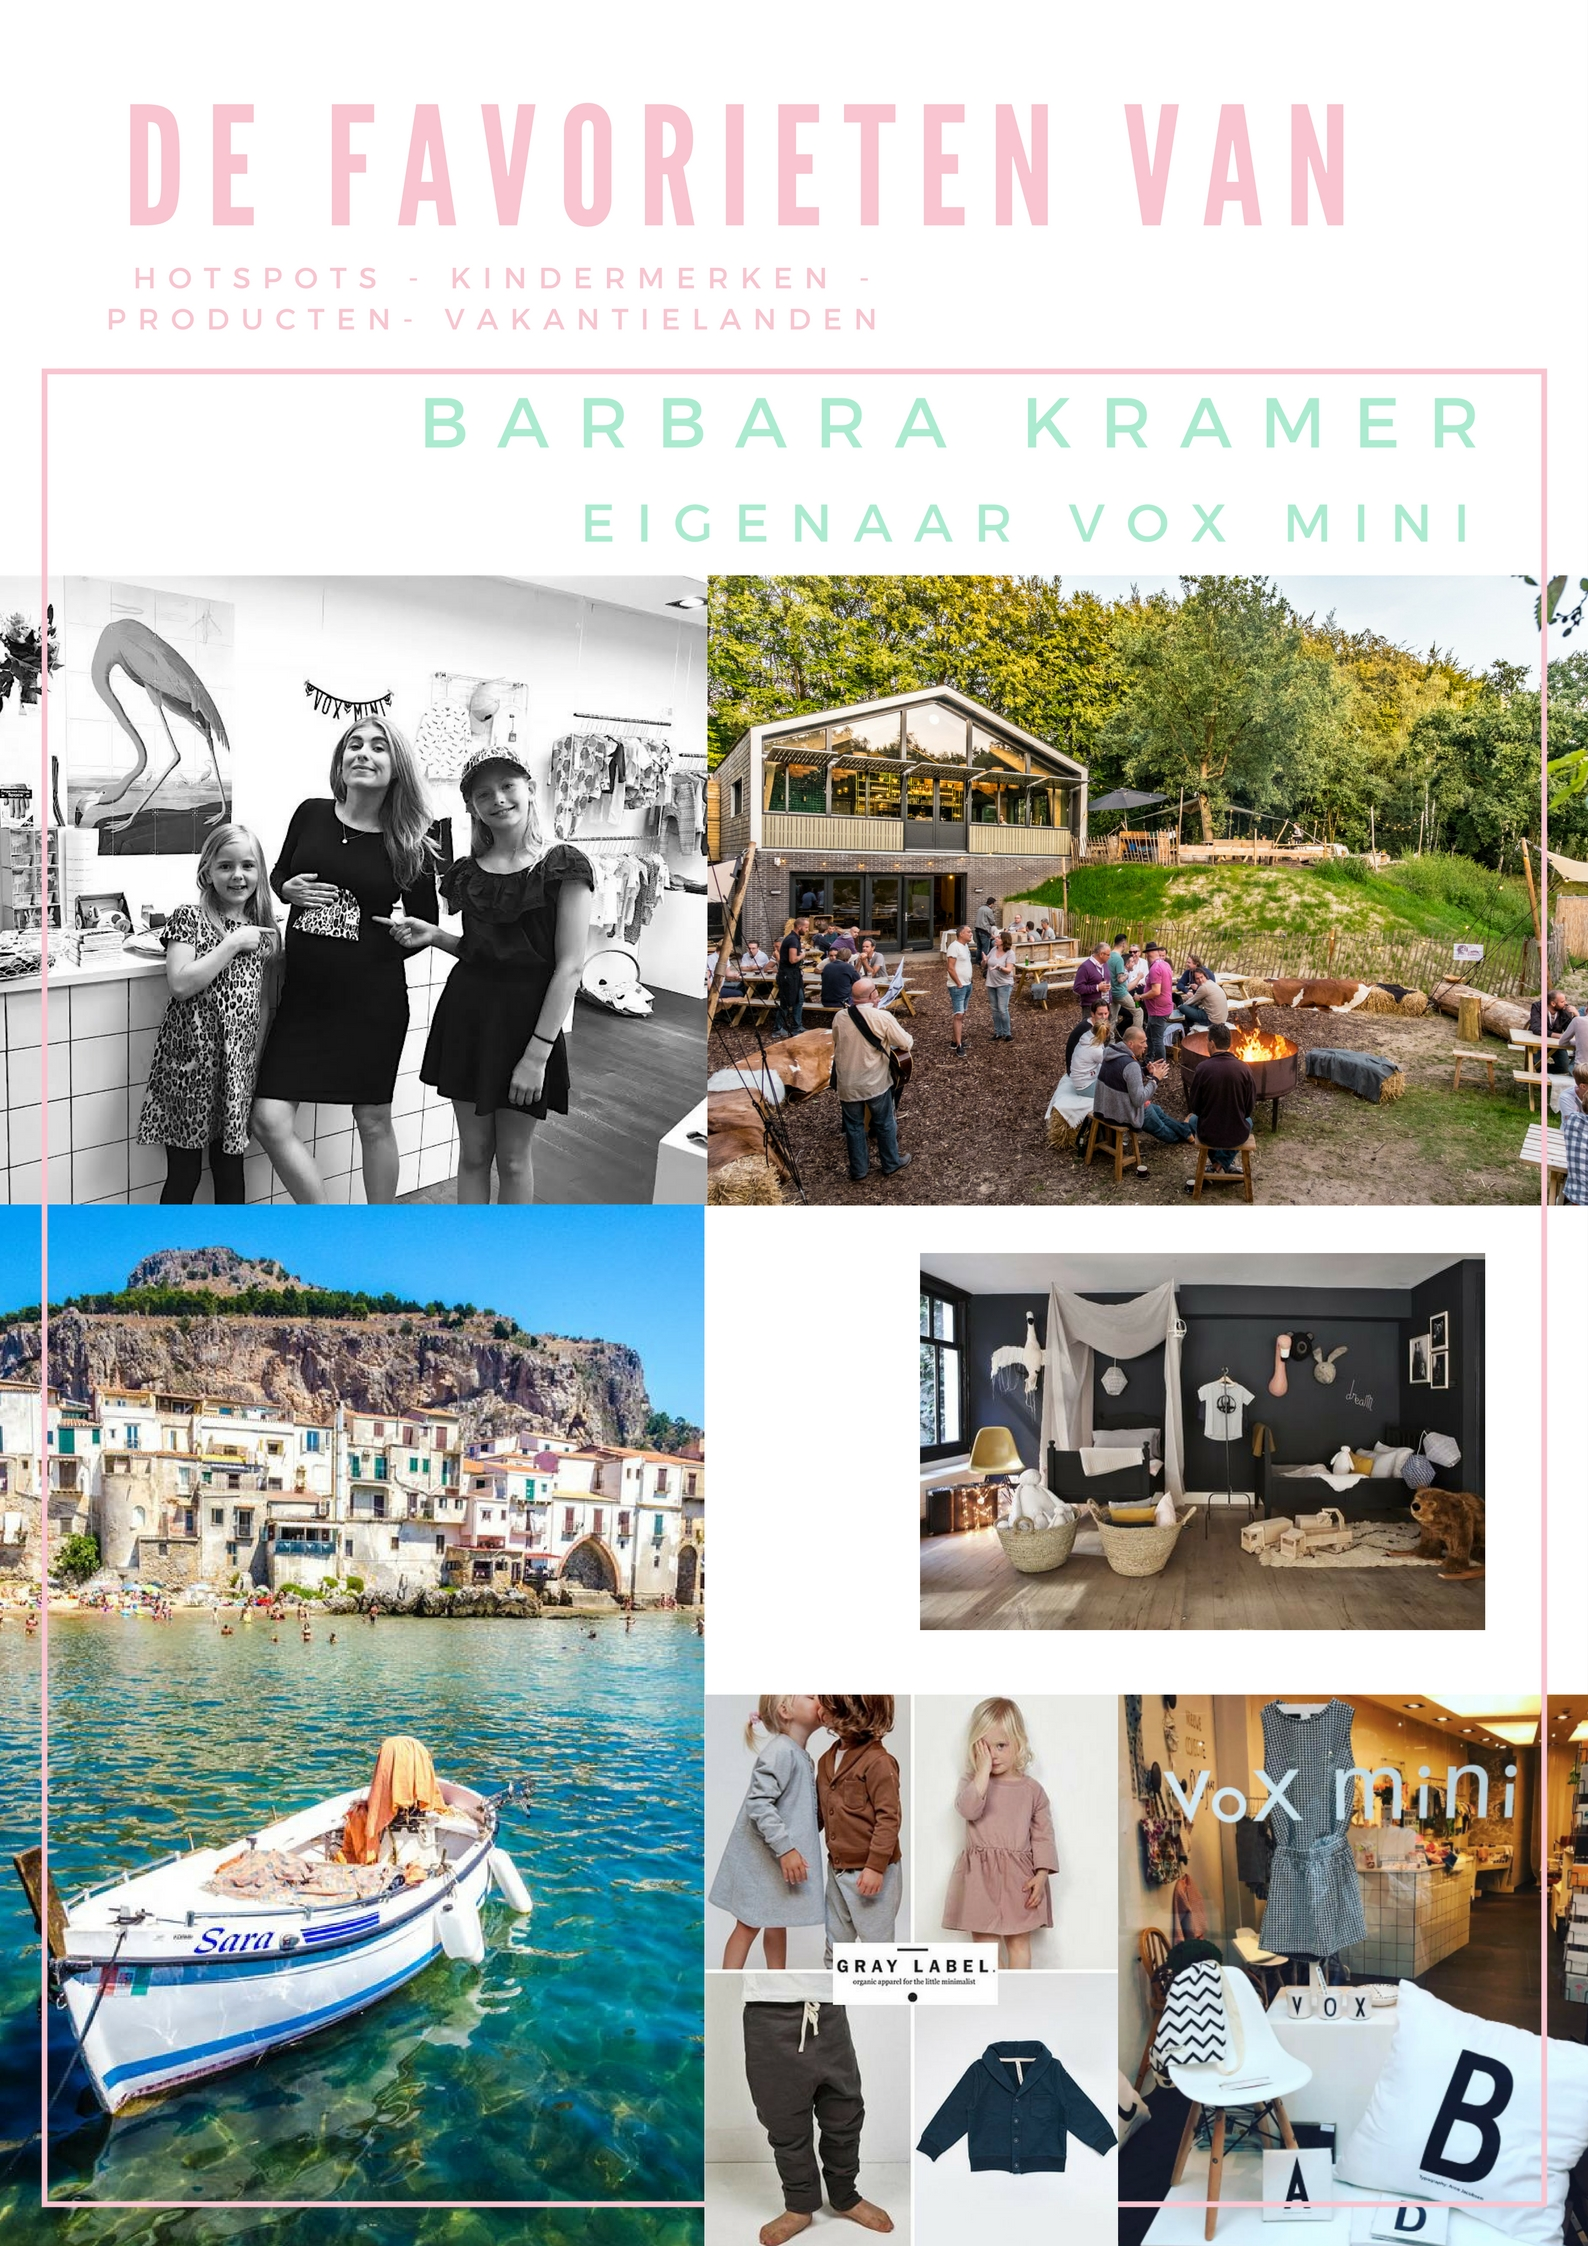 De Favorieten van Barbara Kramer Vox Mini   CITYMOM.nl